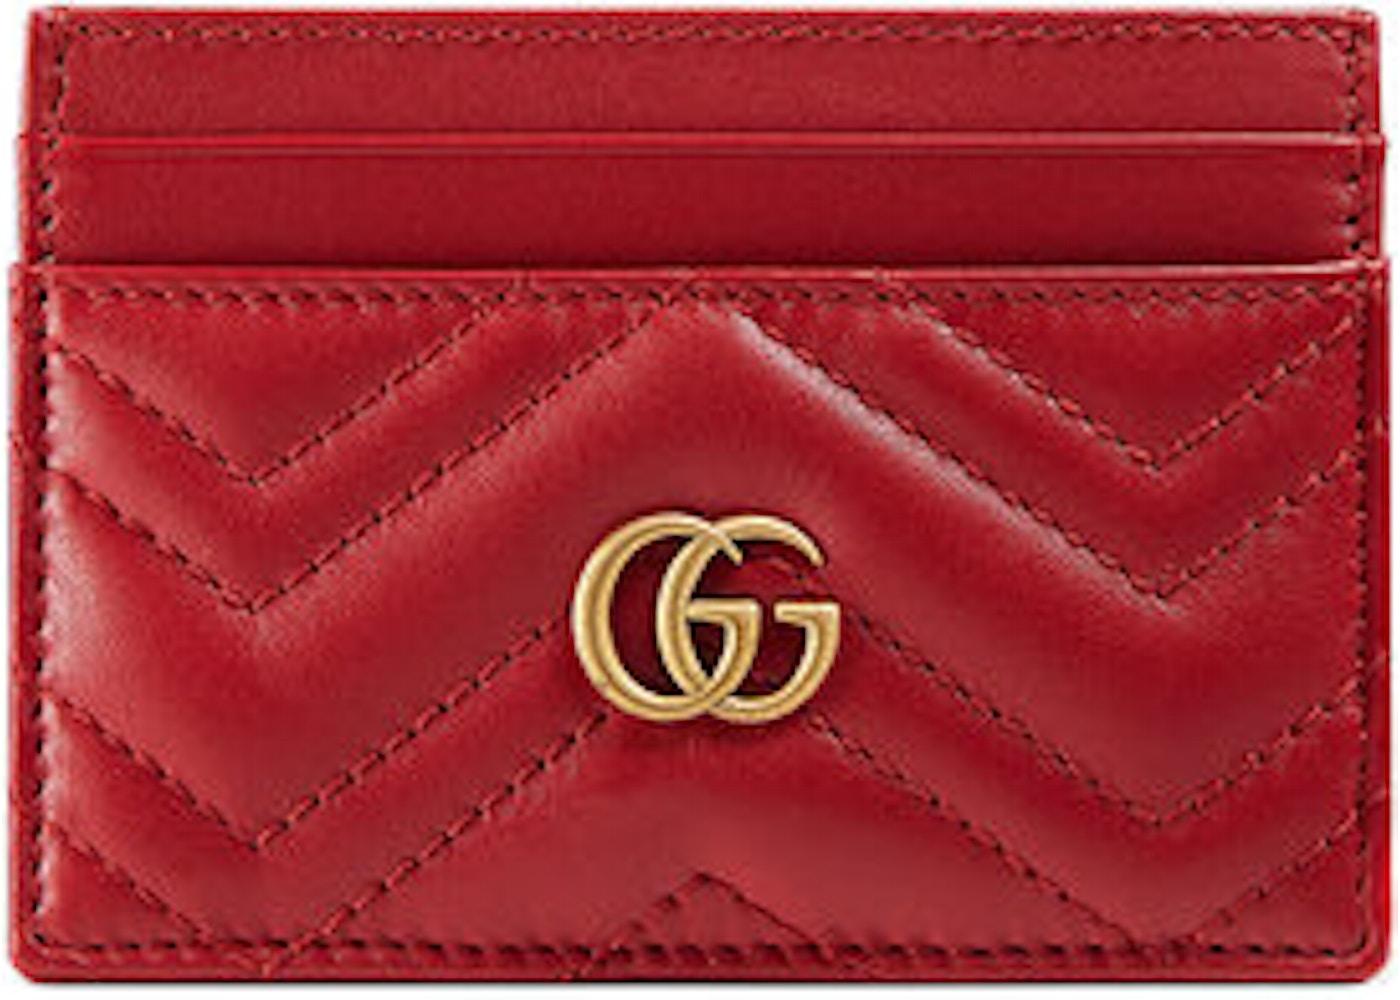 b007832a4b67d1 Buy & Sell Gucci Luxury Handbags